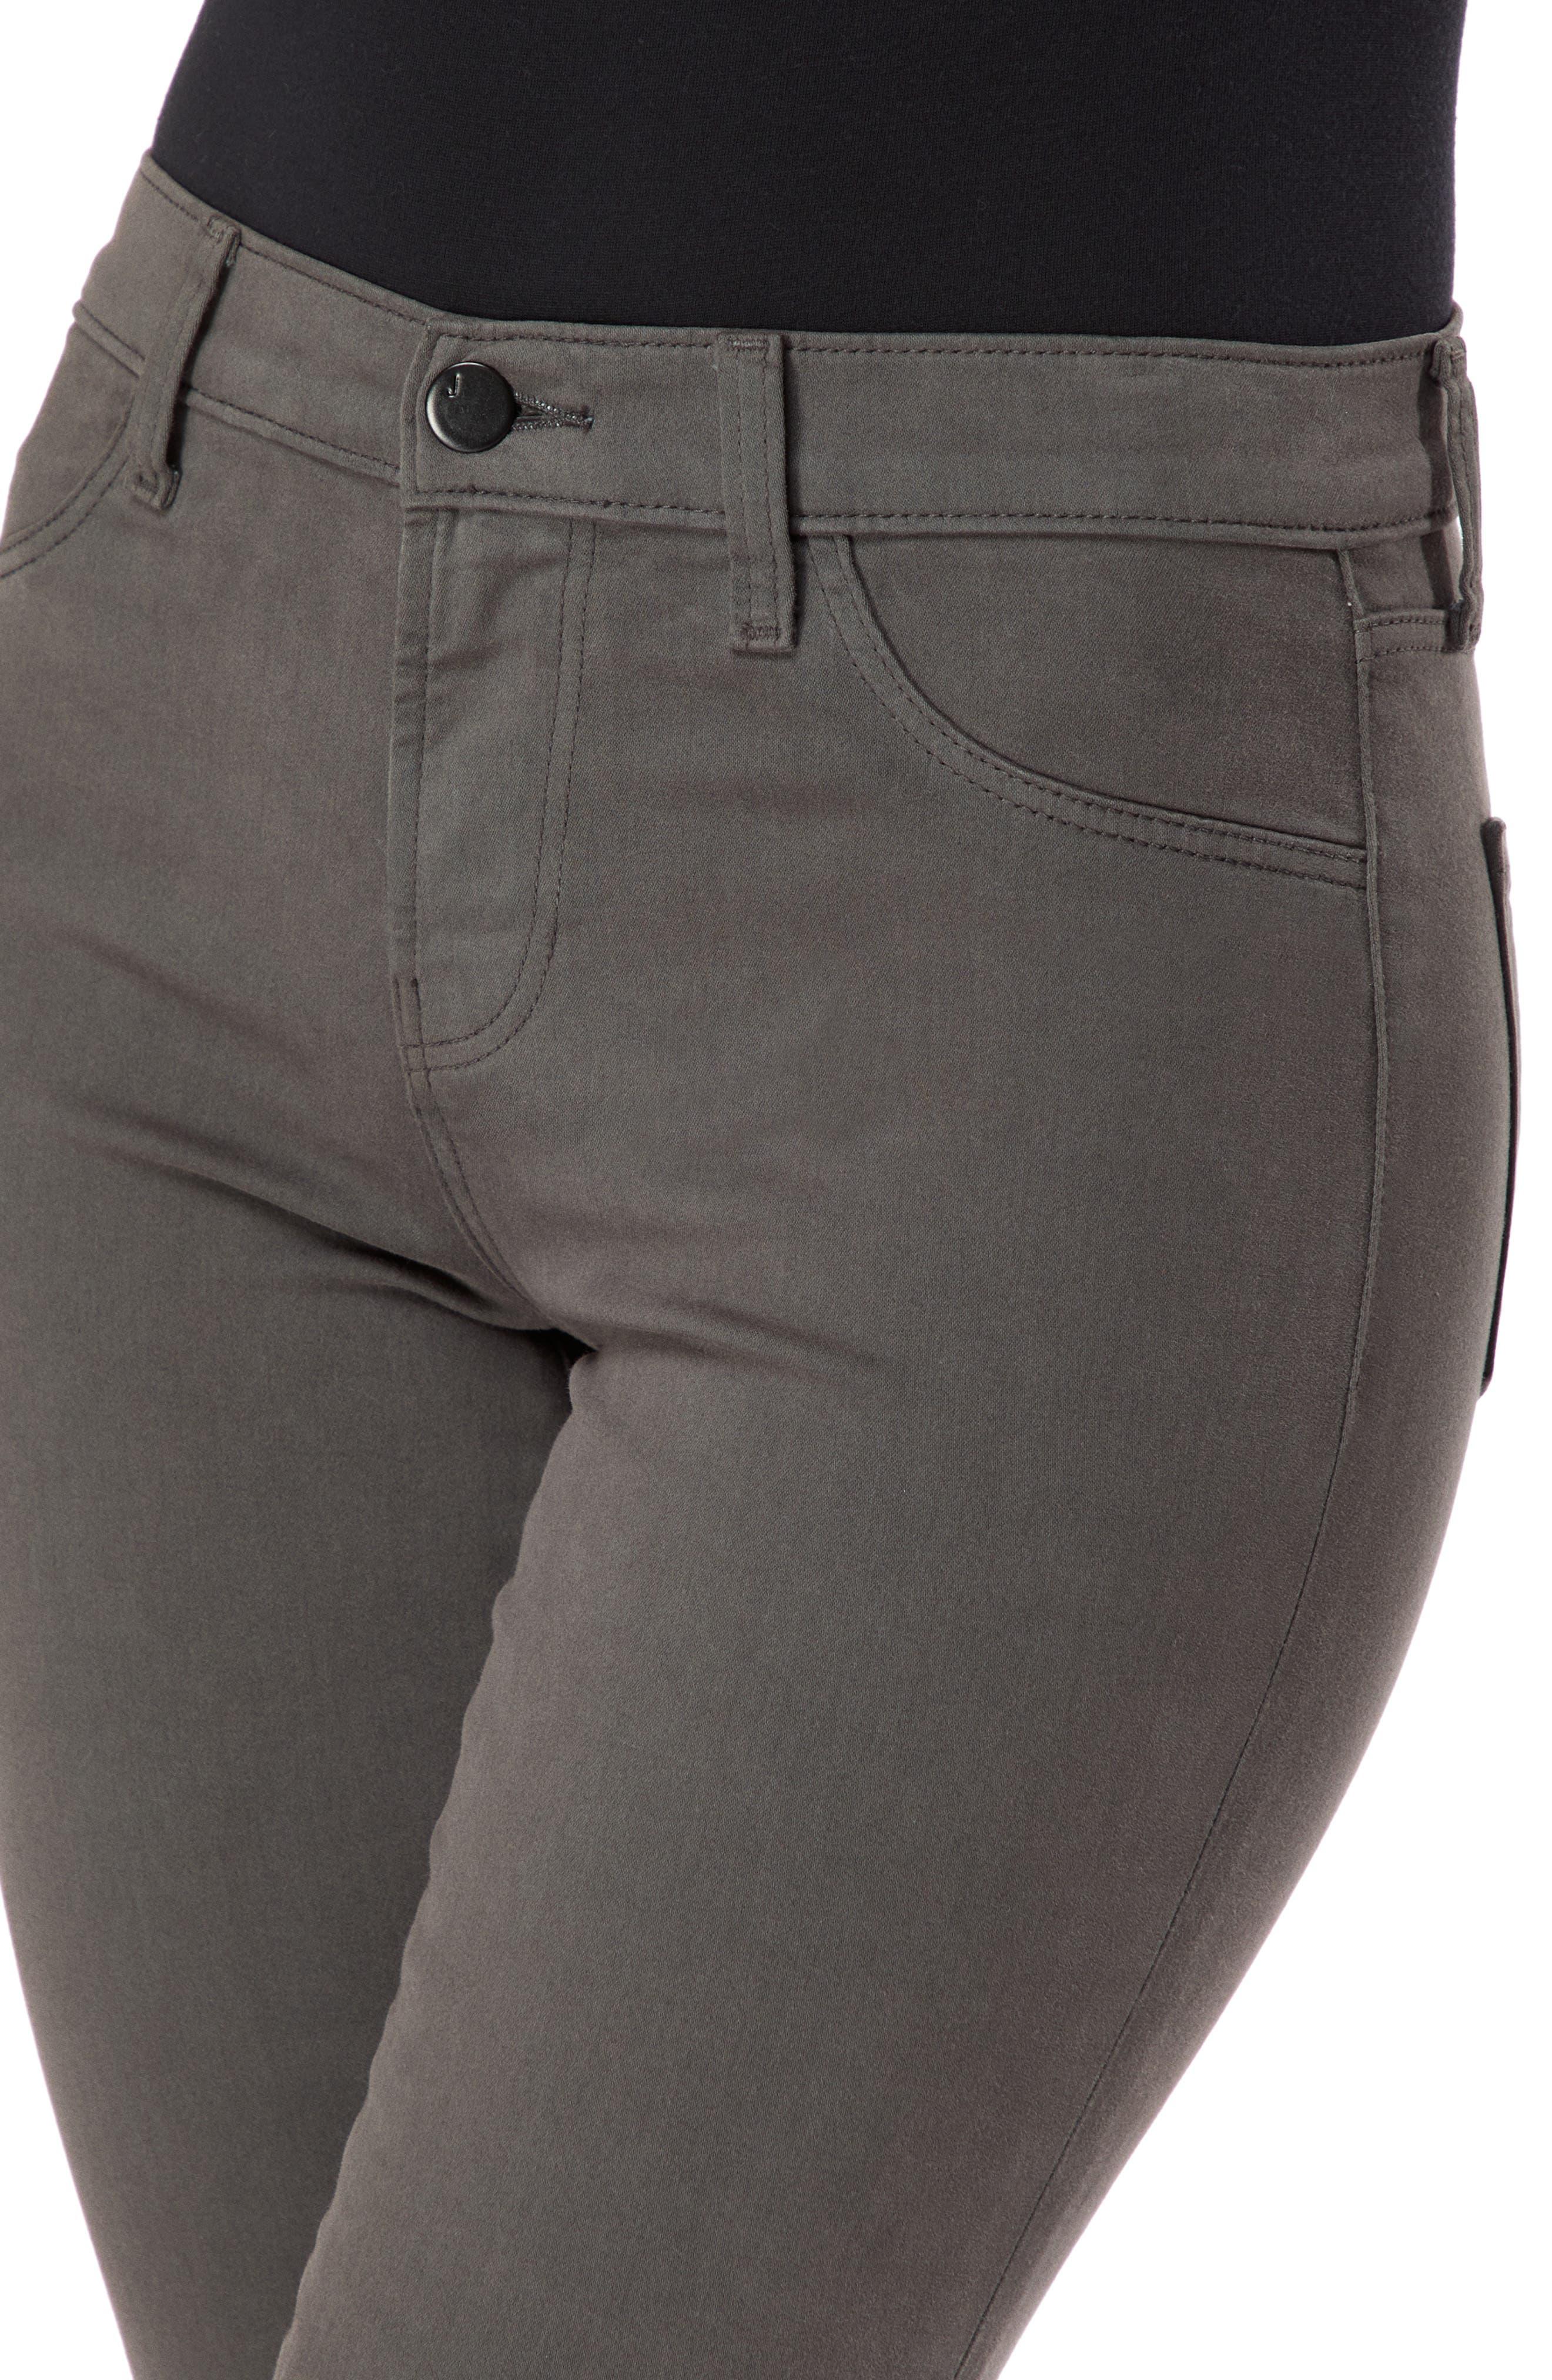 485 Mid Rise Skinny Jeans,                             Alternate thumbnail 4, color,                             FUTURE